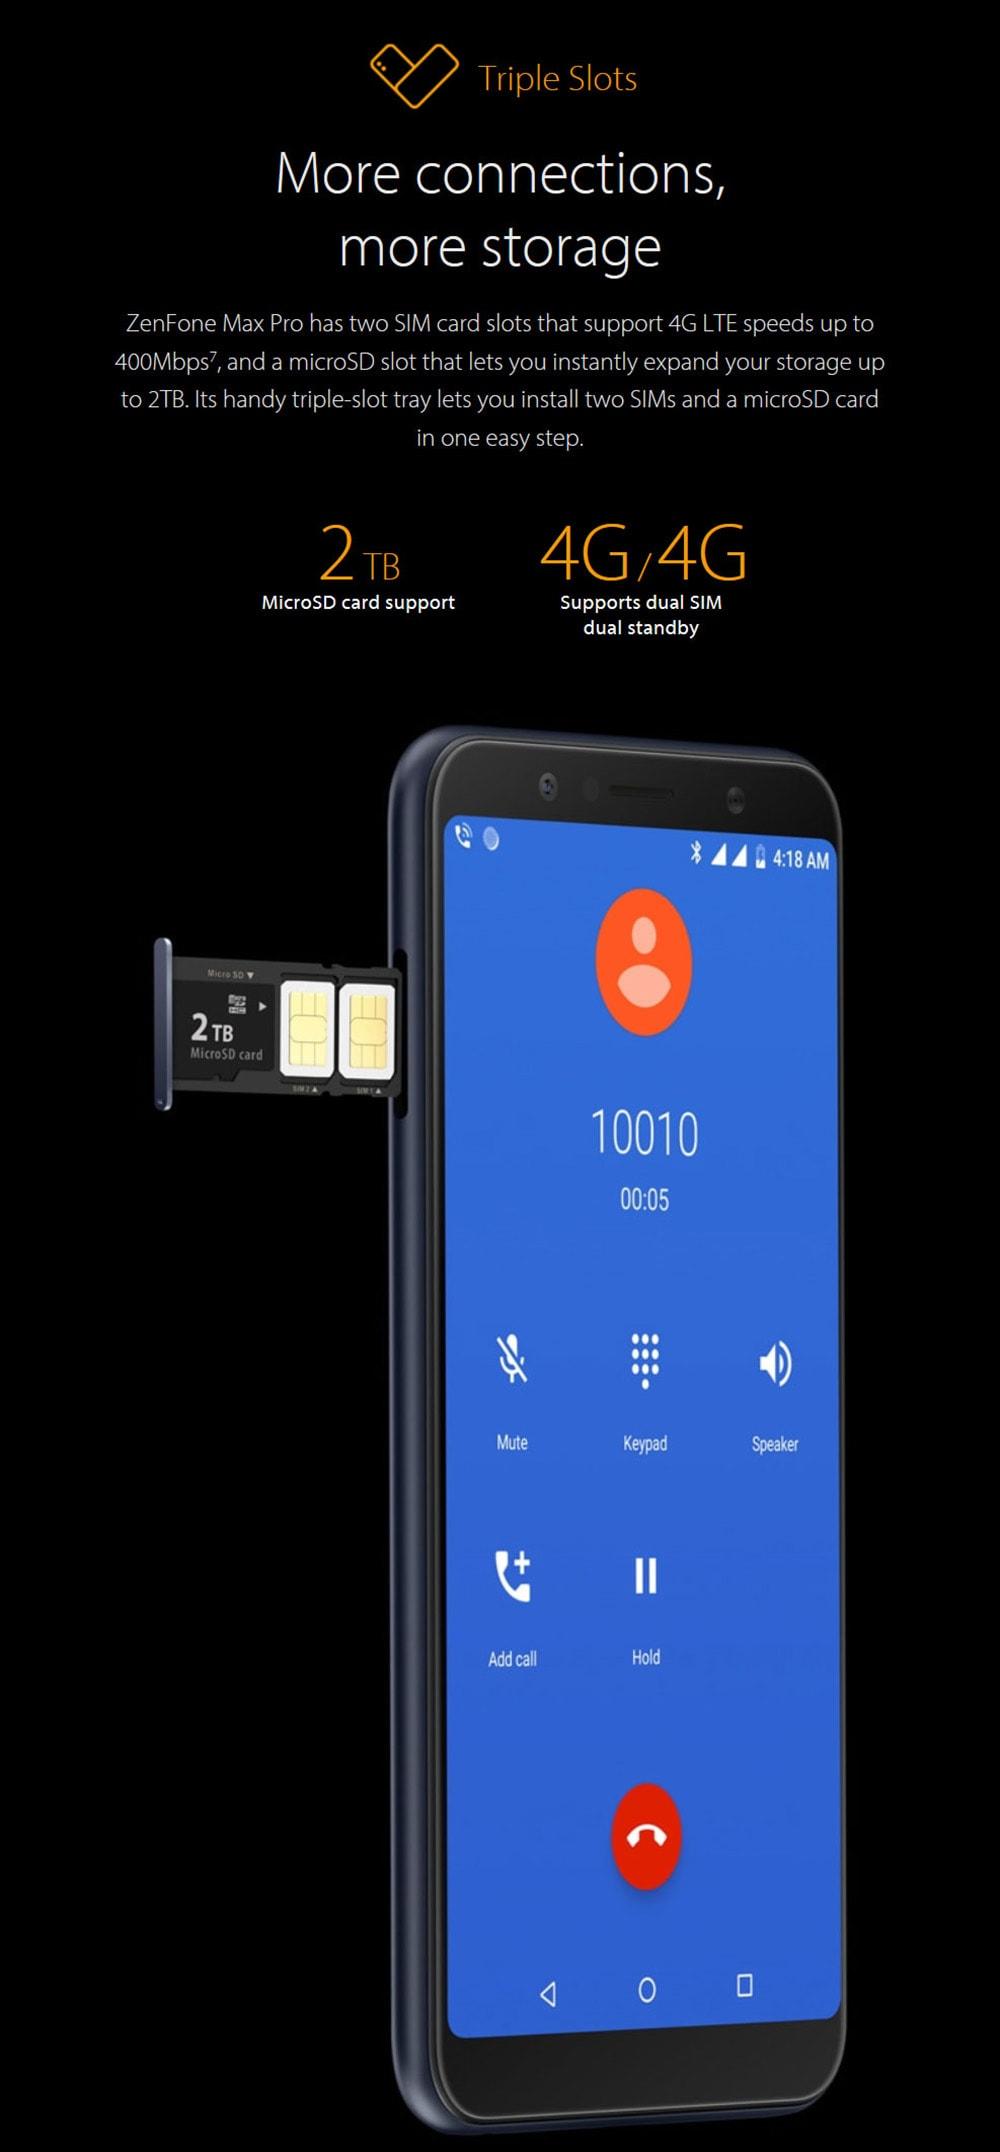 ASUS ZenFone Max Pro ( M1 ) 4G Phablet 6.0 inch Android 8.1 Oreo Snapdragon 636 Octa Core 1.8GHz 3GB RAM 32GB ROM 16.0MP + 5.0MP Rear Camera Fingerprint Sensor 5000mAh Built-in- Silver